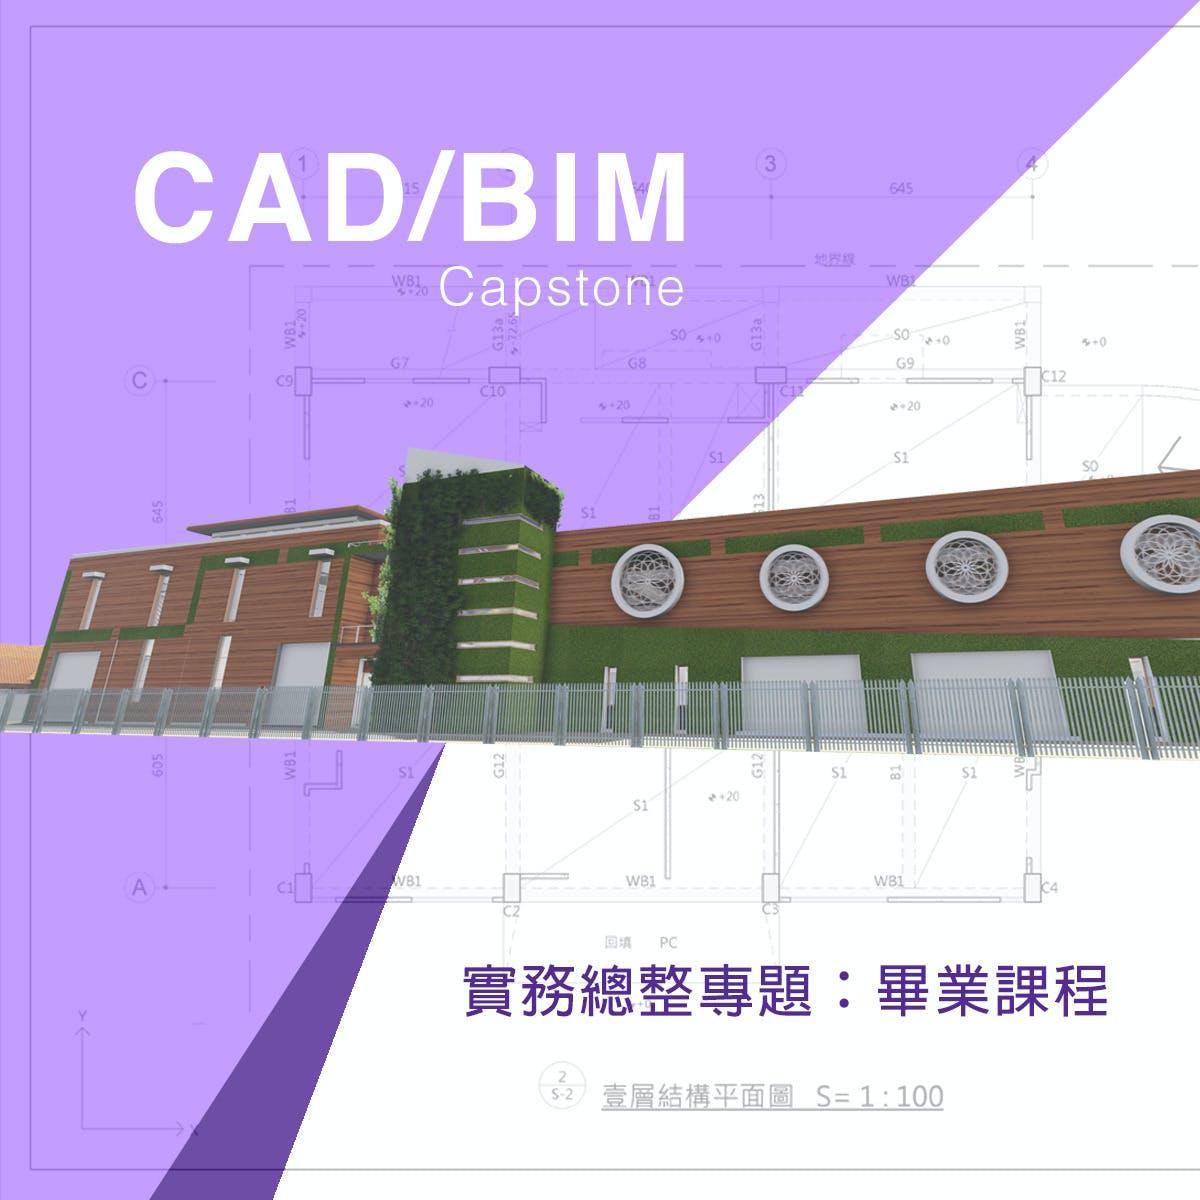 CAD/BIM技術與應用專項課程(CAD/BIM Specialization)